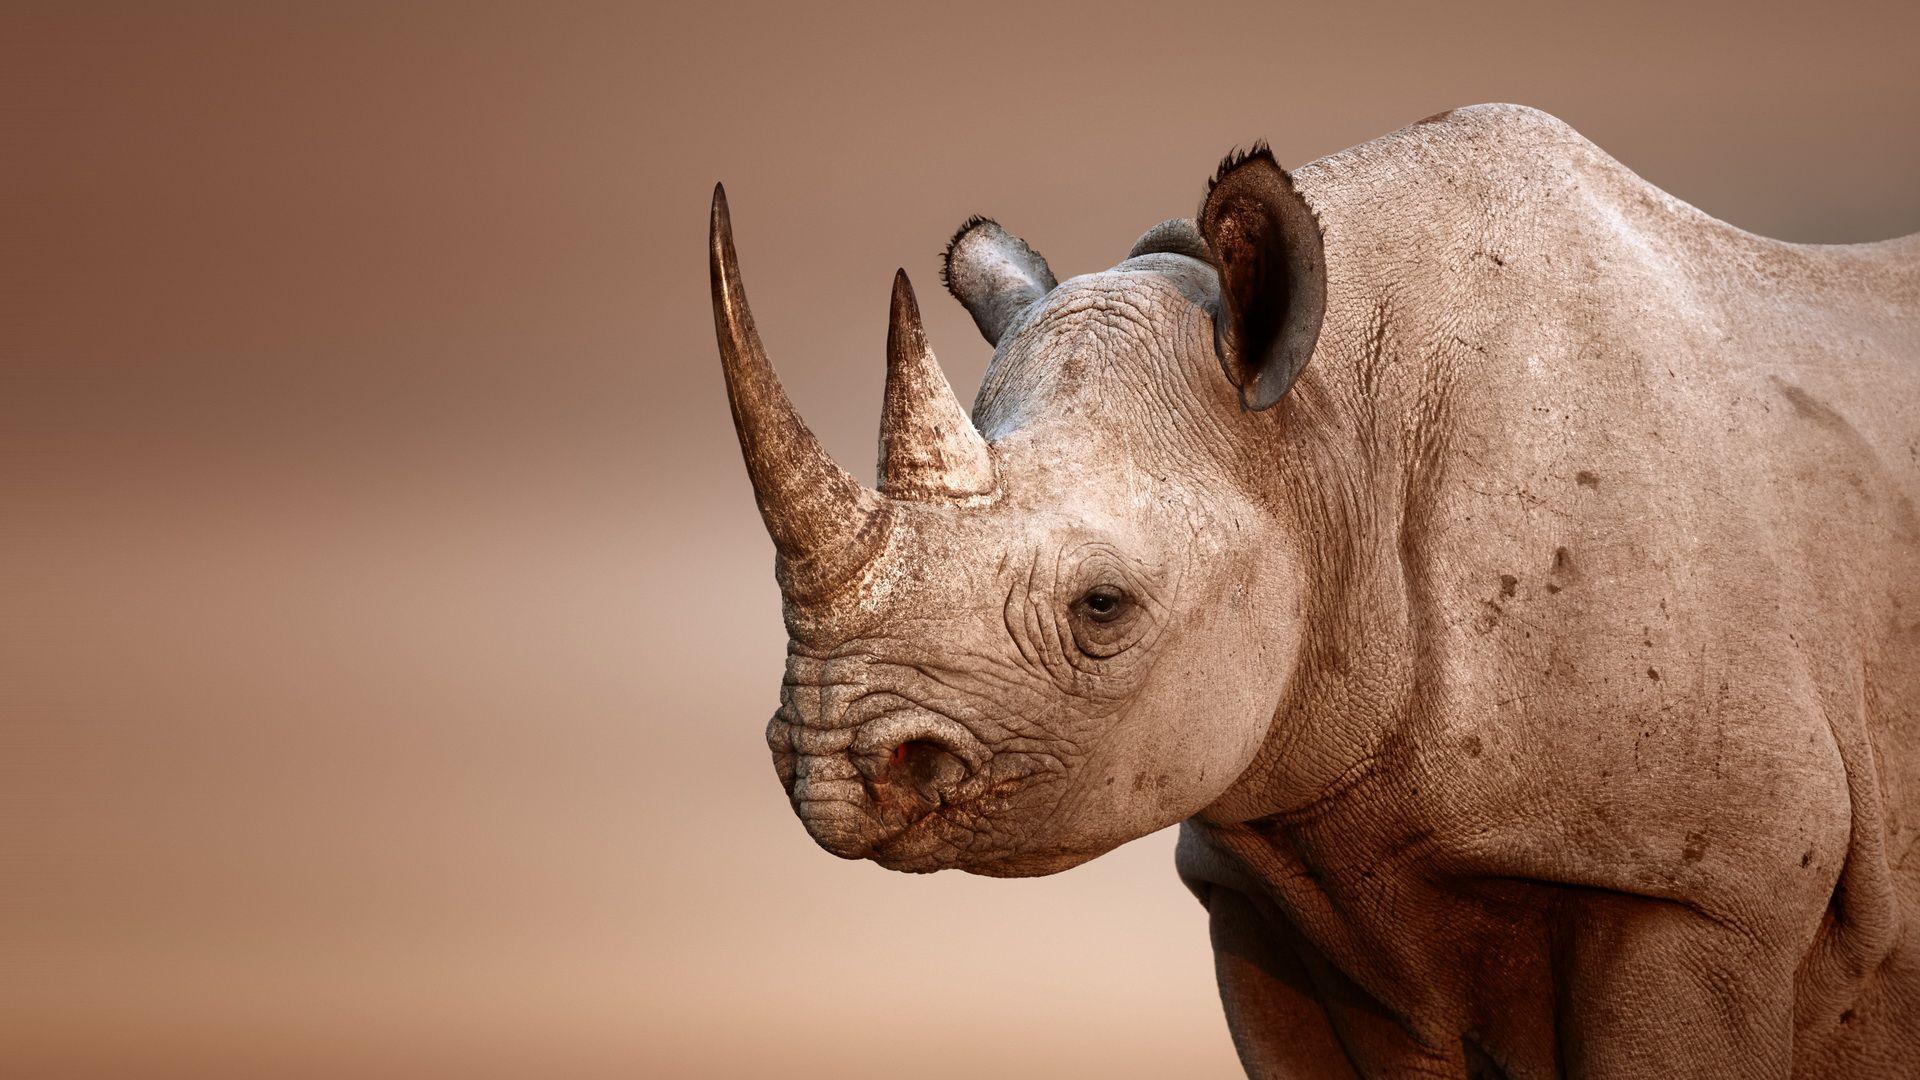 fantastic hd rhinoceros wallpapers   wallpapers   pinterest